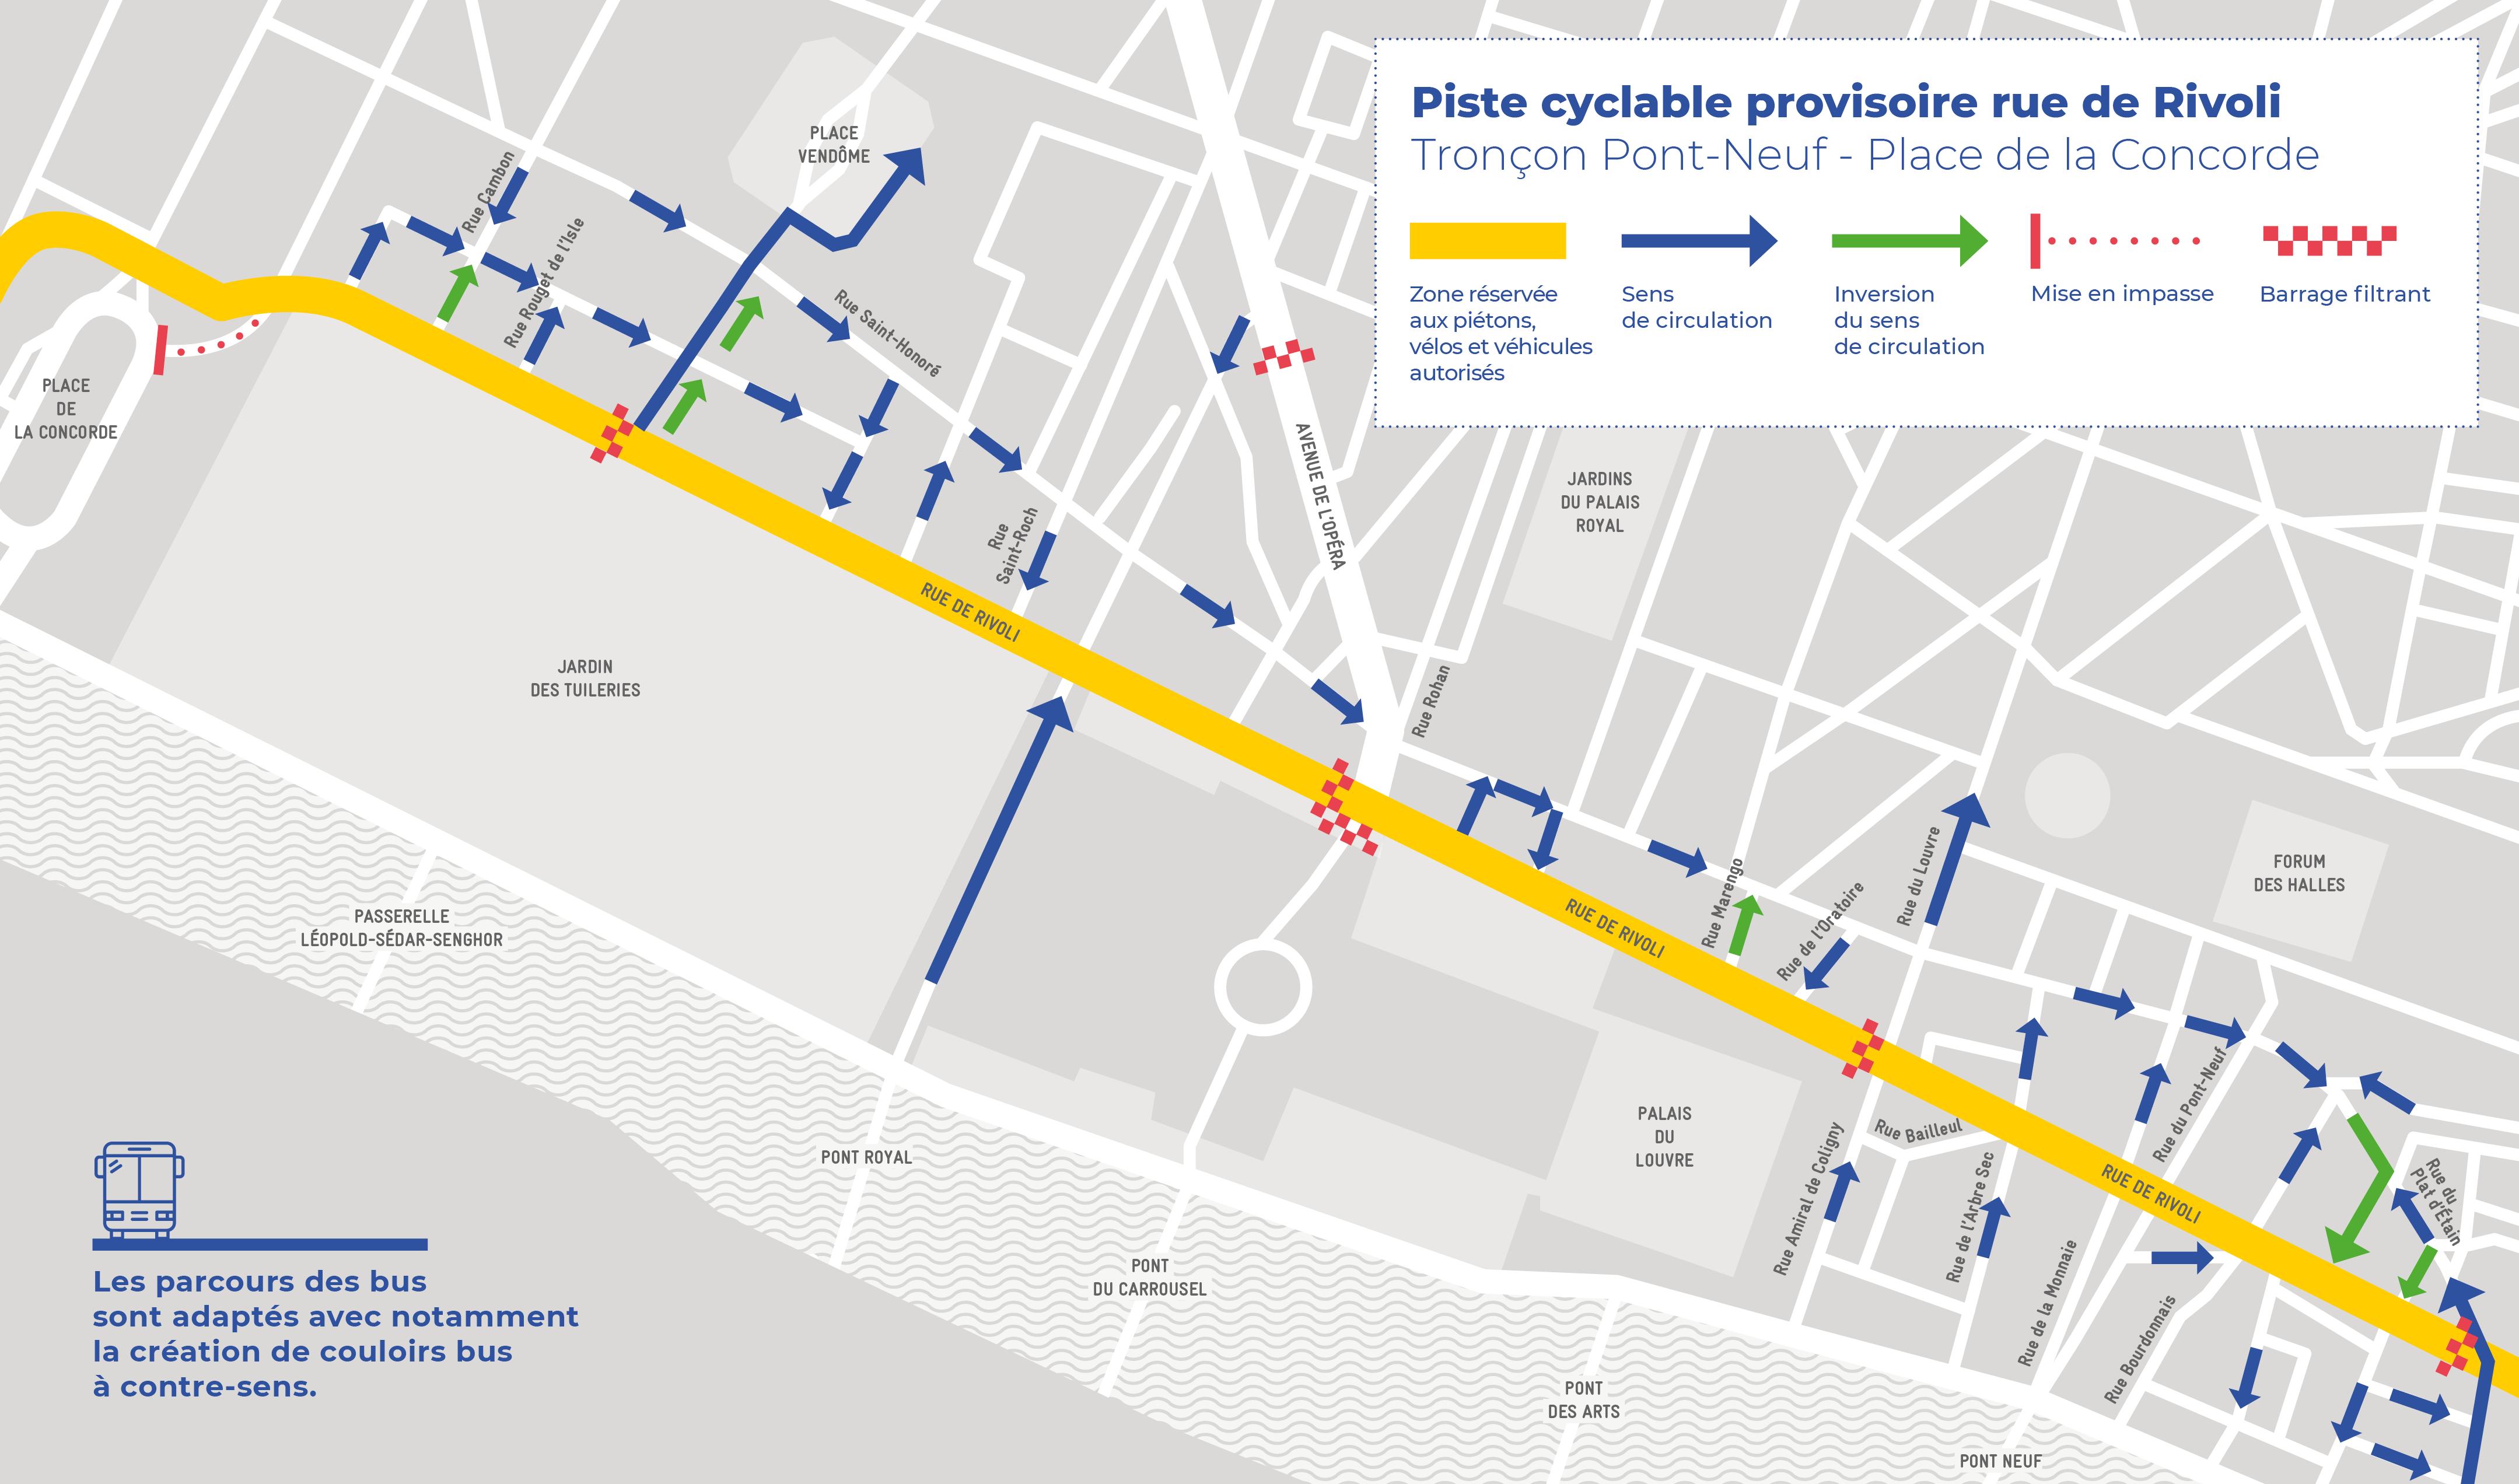 plan de la piste cyclable rue de Rivoli, tronçon Pont Neuf - Bastille